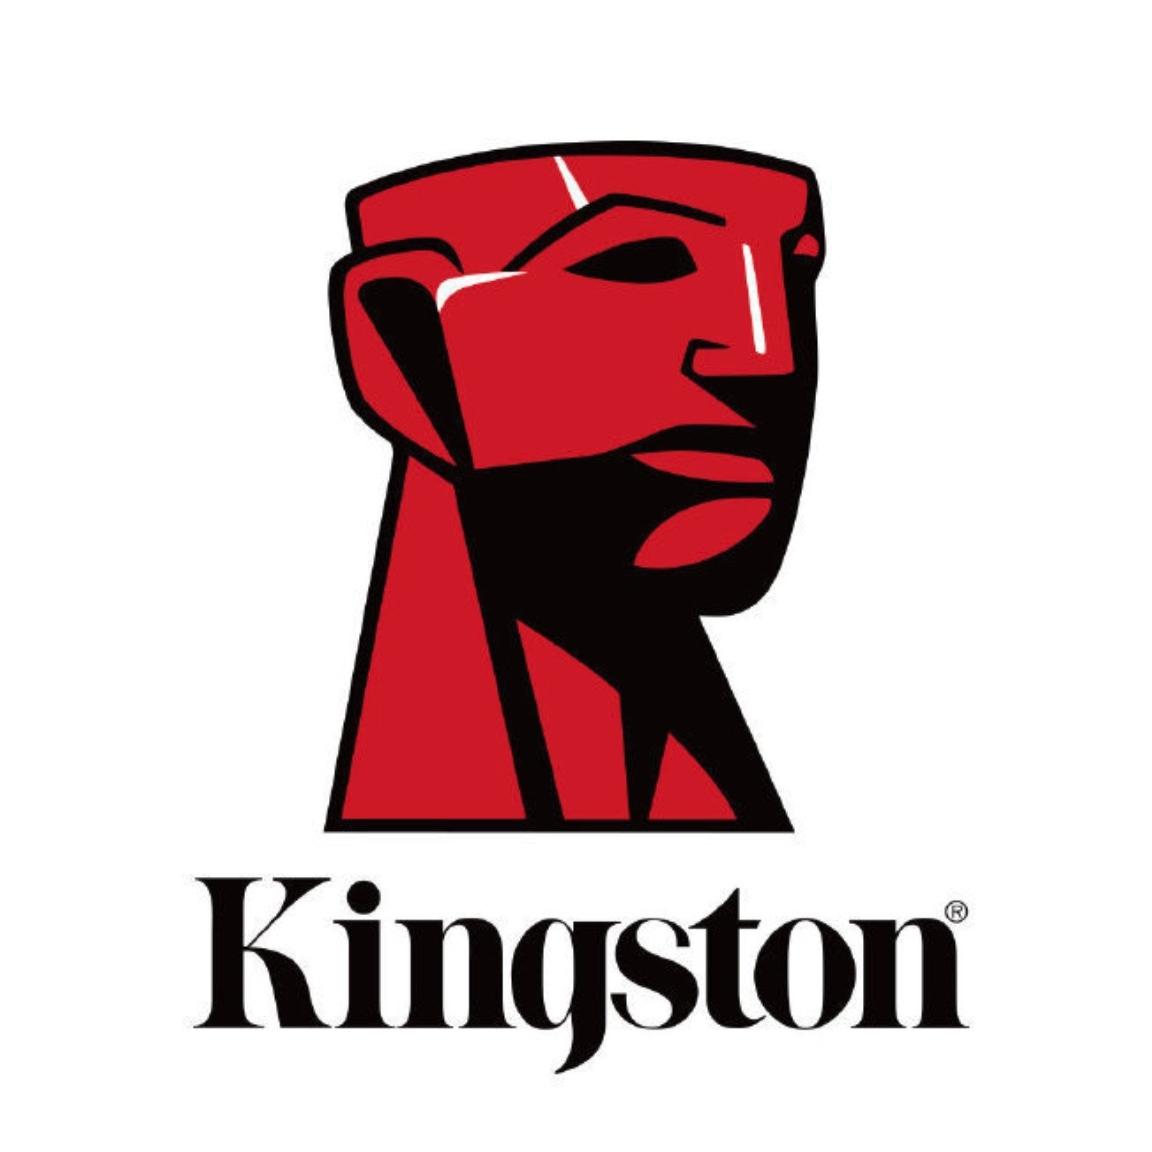 金士顿/Kingston